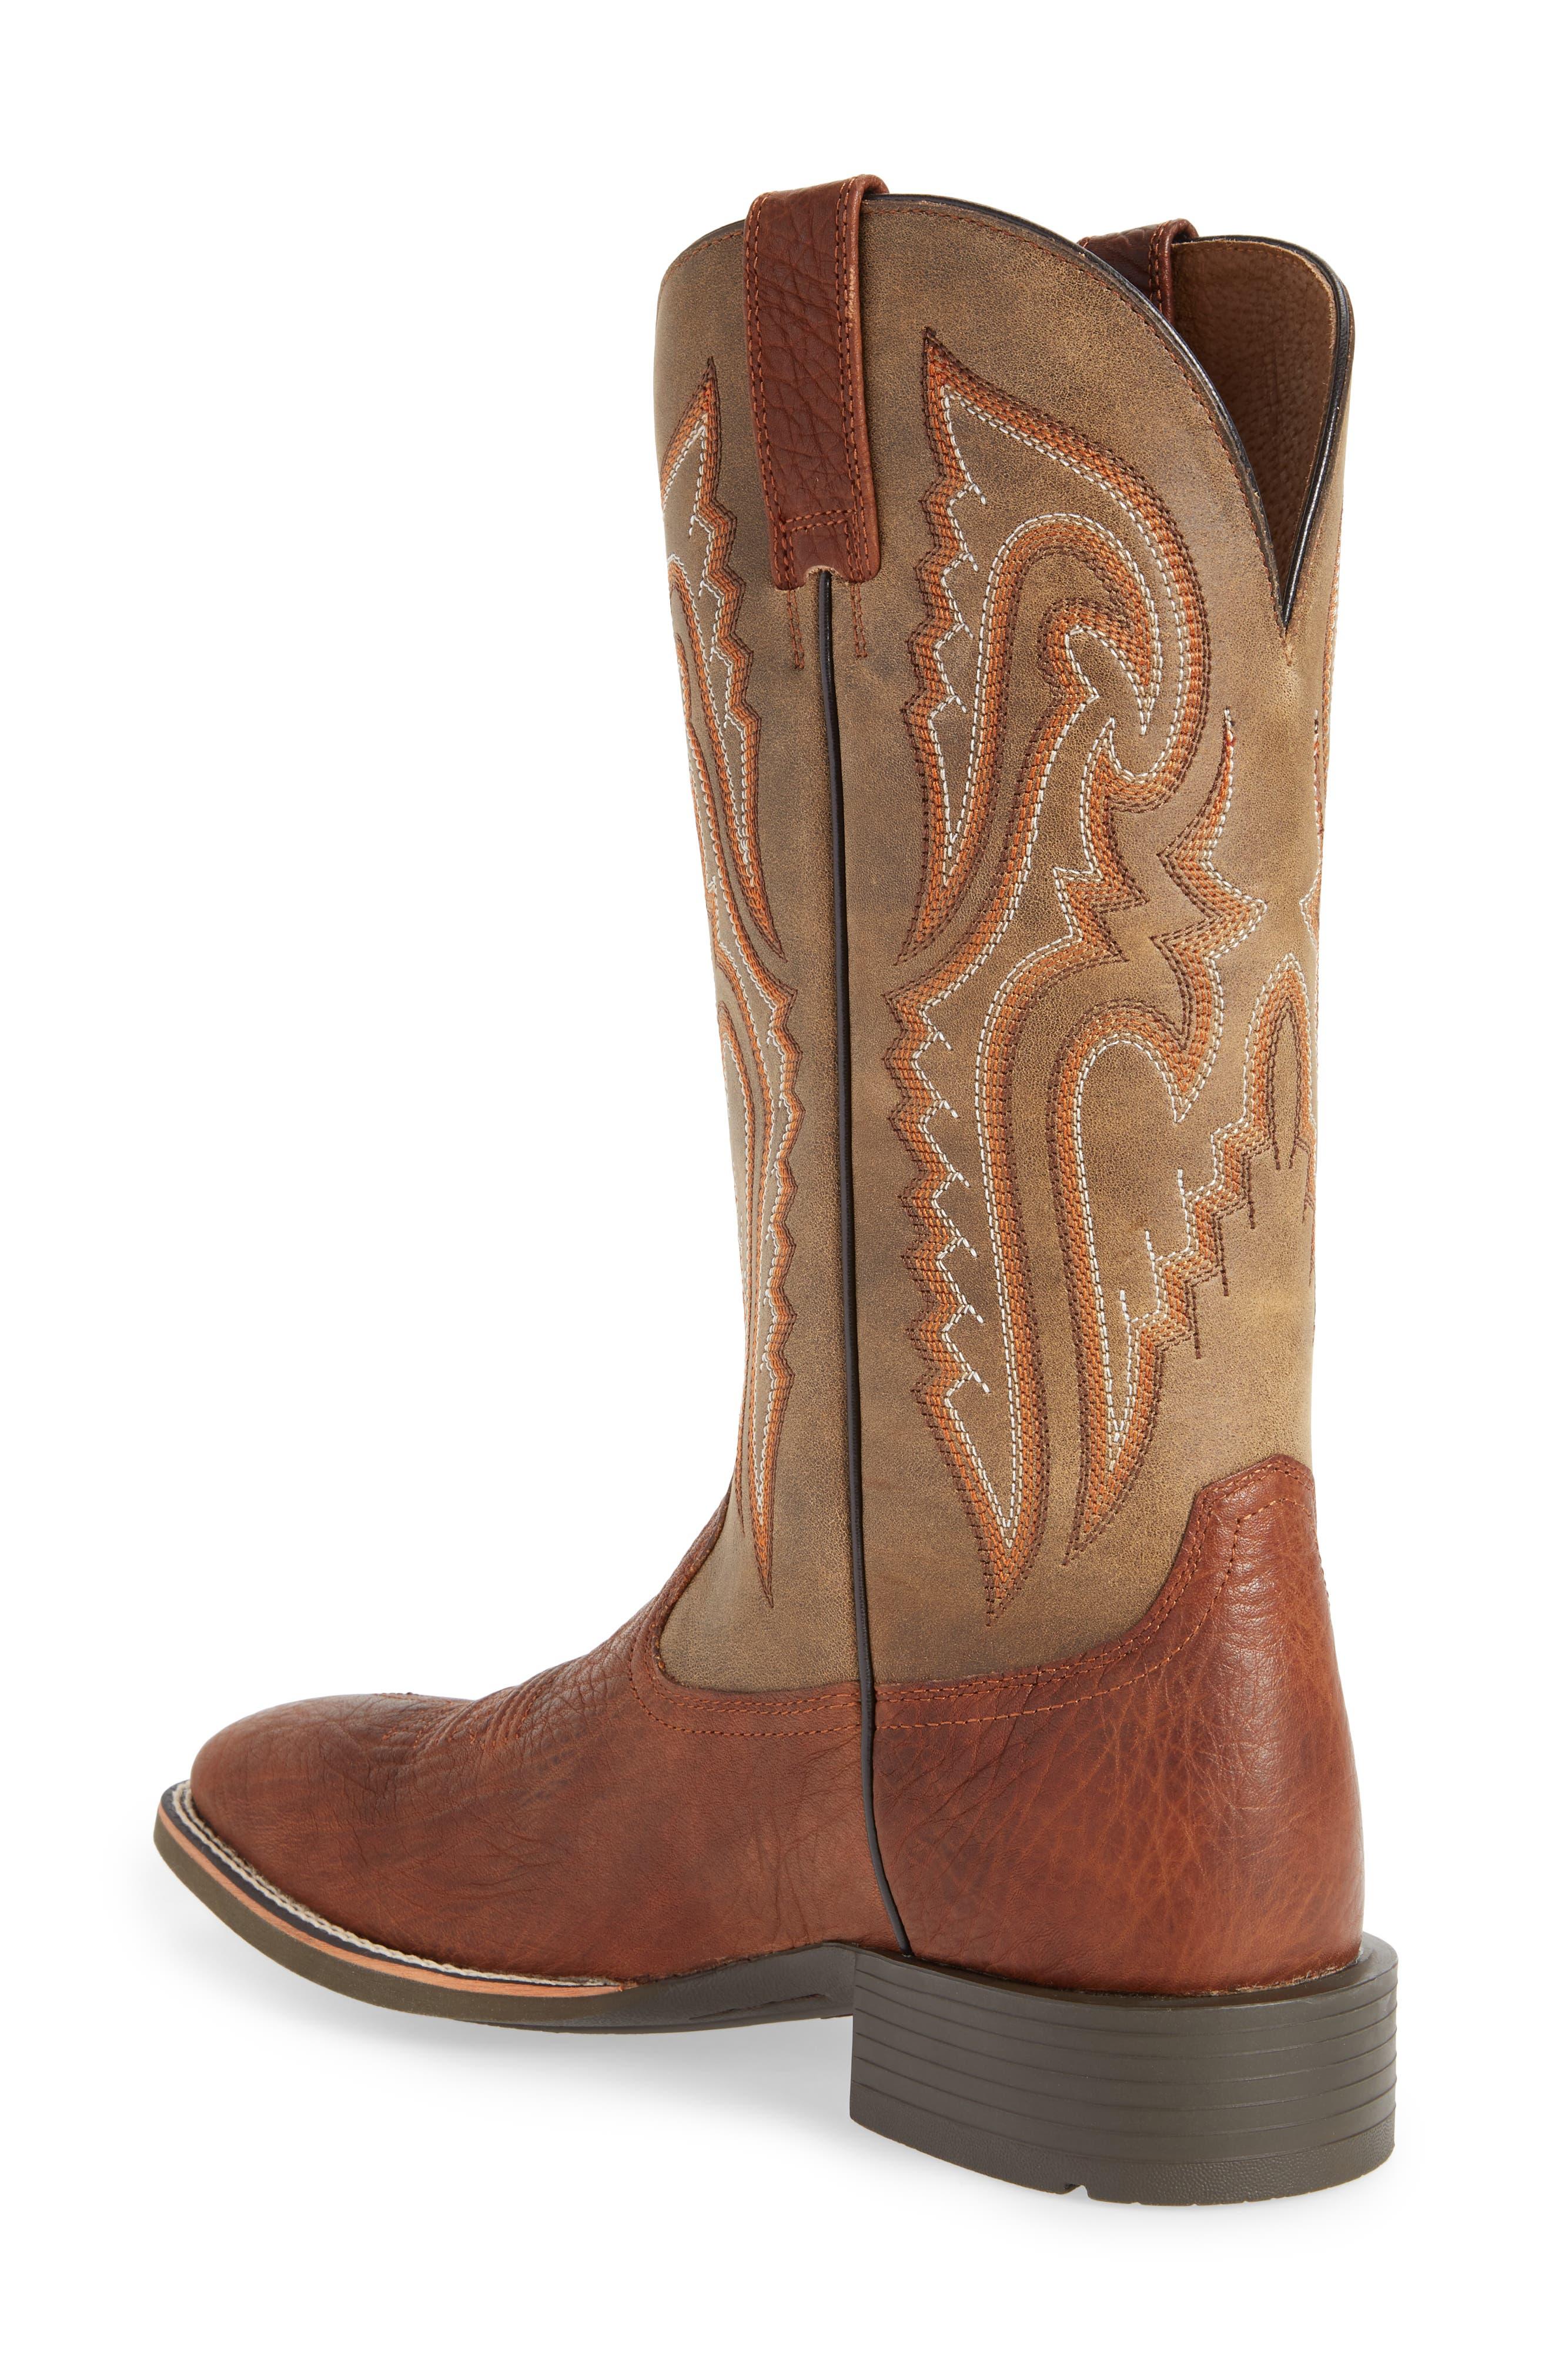 Heritage Latigo Square Toe Cowboy Boot,                             Alternate thumbnail 2, color,                             COGNAC/ BROWN BOMBER LEATHER